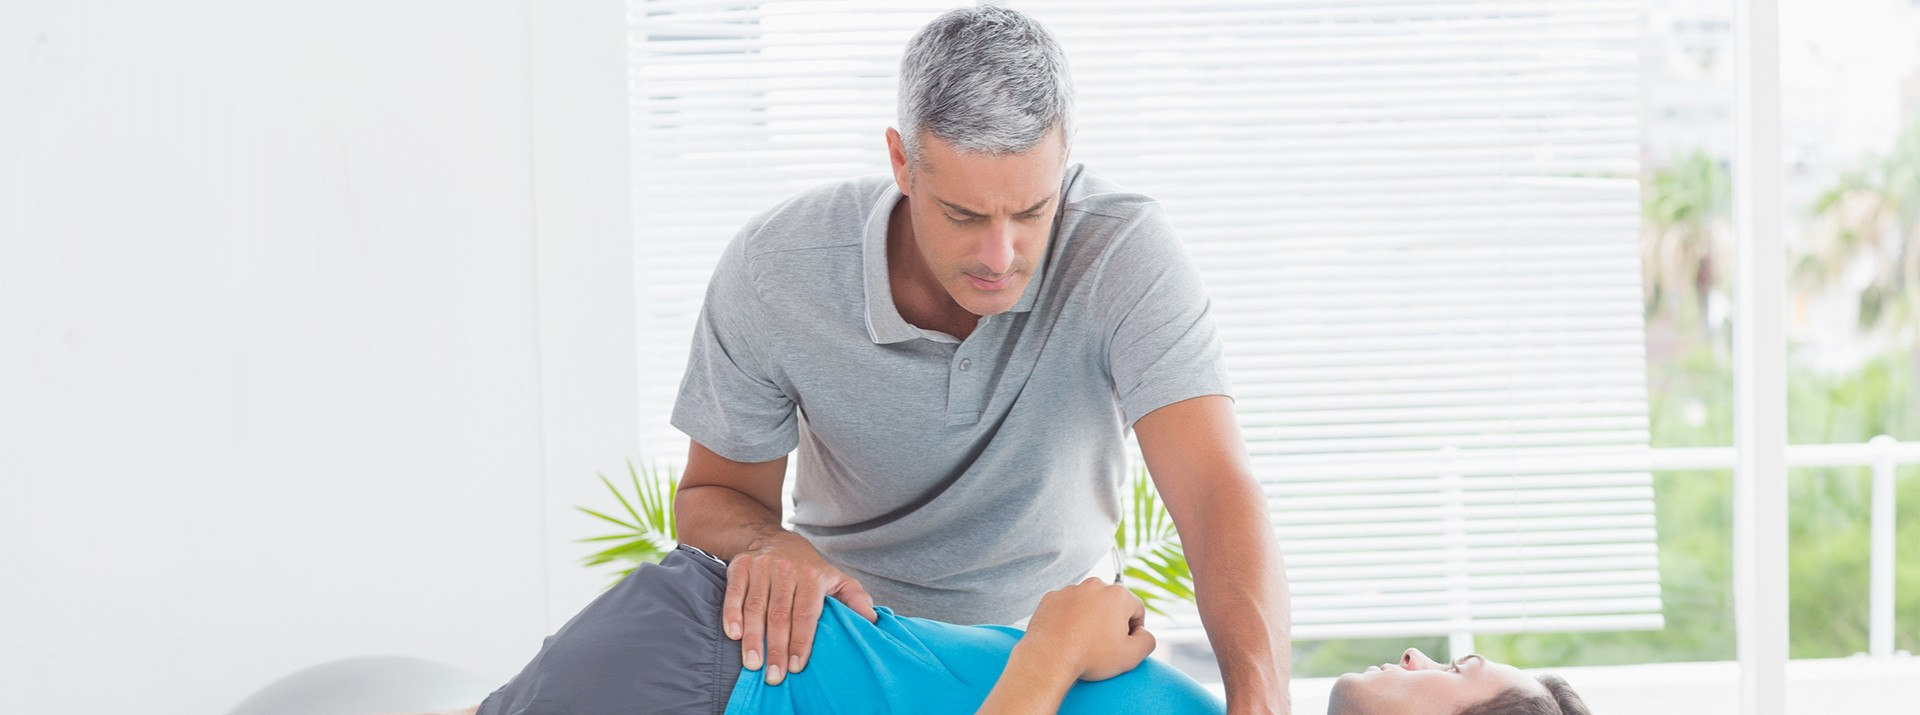 ADM Ottawa Physiotherapy - Serving Ottawa Residents Since 1995